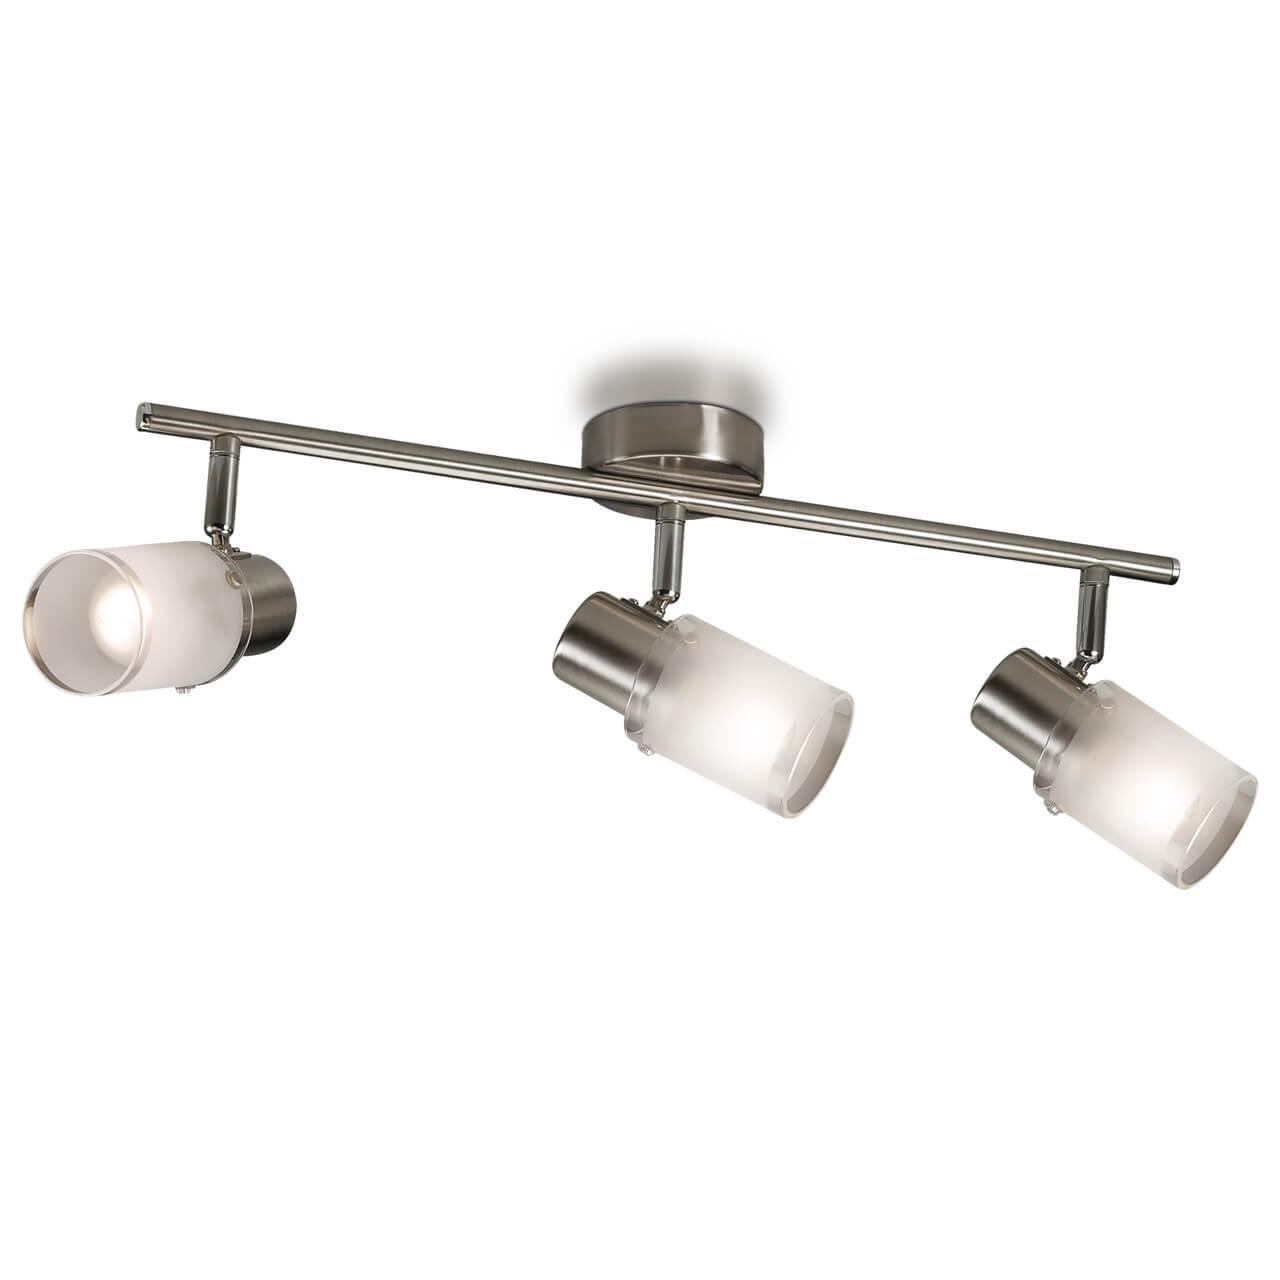 Спот Odeon Light 2175/3W, E14, 40 Вт zdm candle style e14 3w 180lm 7000k 6 smd 5630 led white light lamp golden 85 265